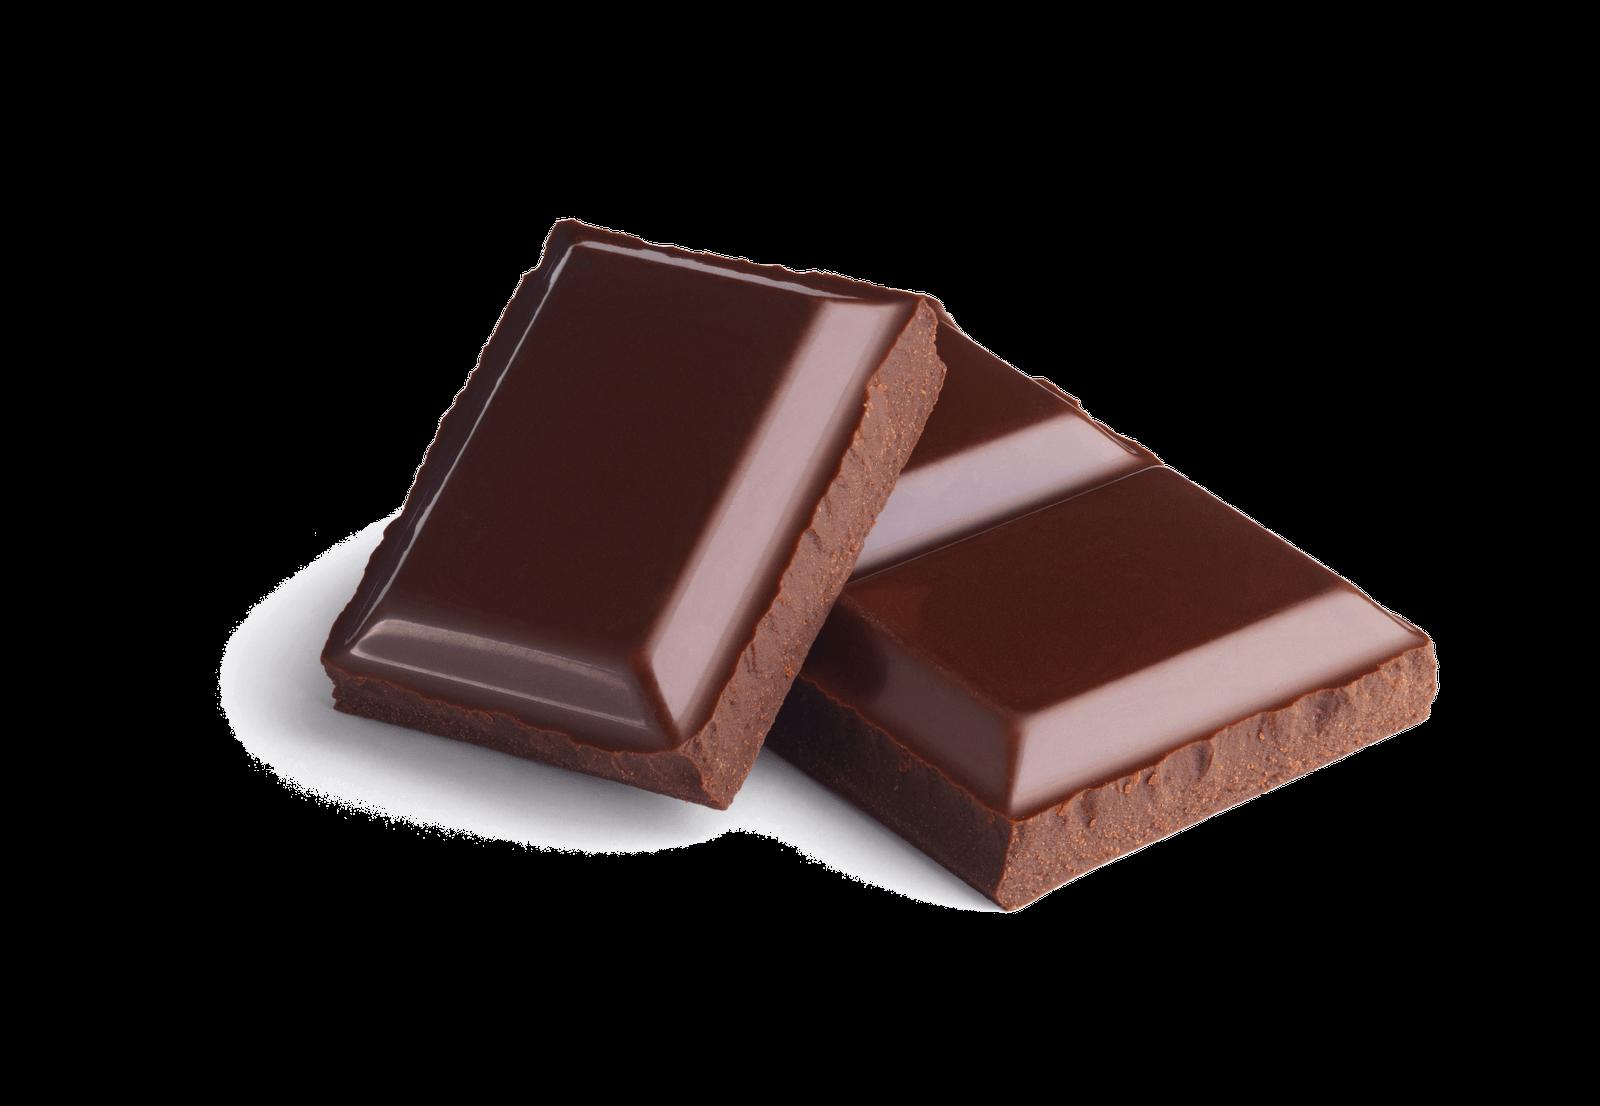 Chocolate Pieces transparent PNG.